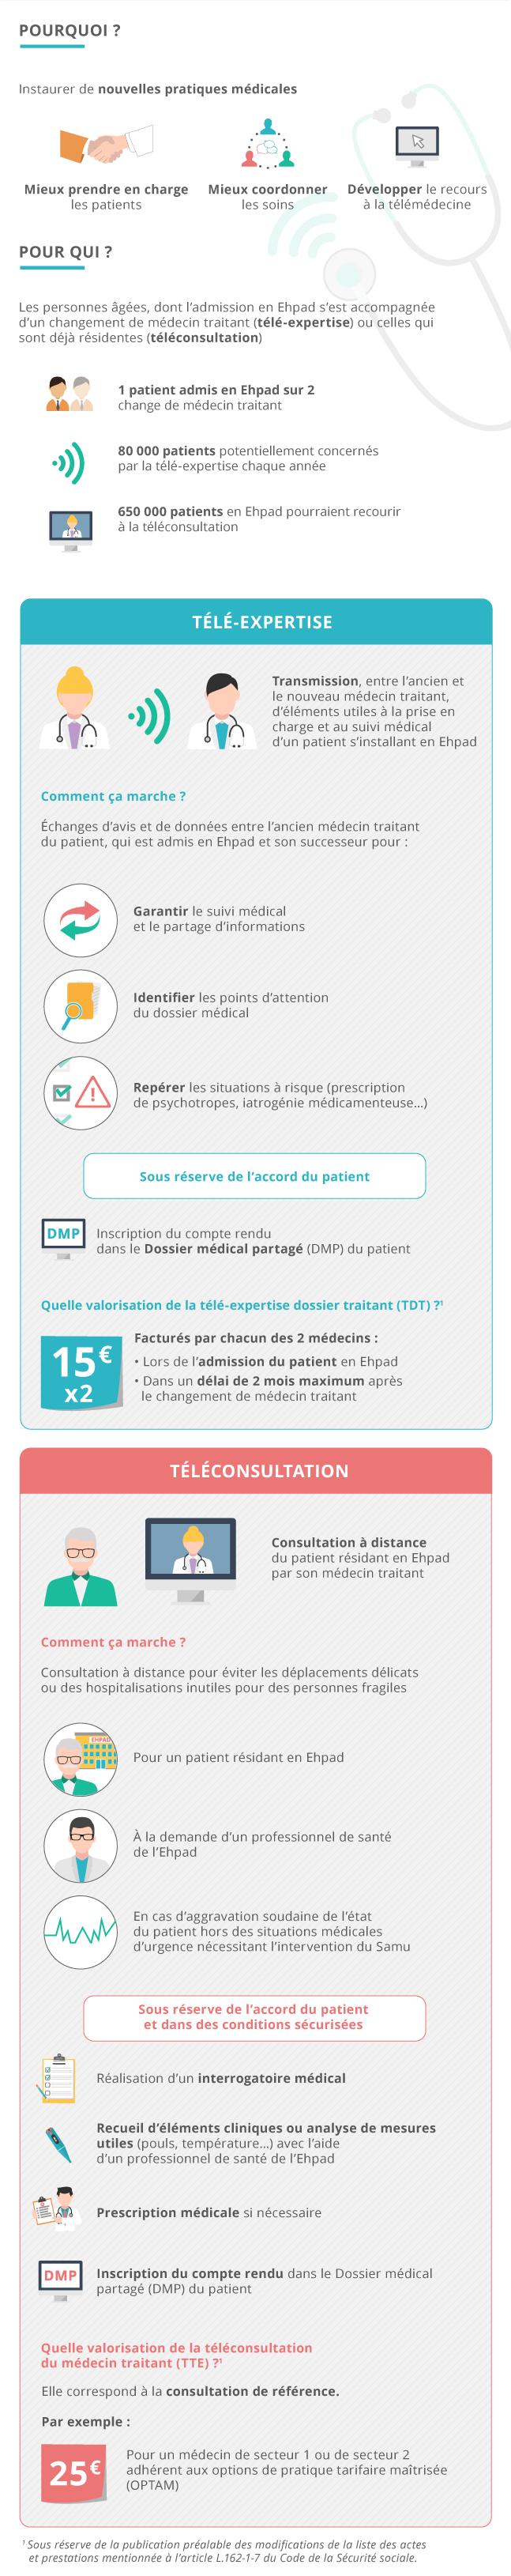 telemedecine-enews-avril17_646px.png